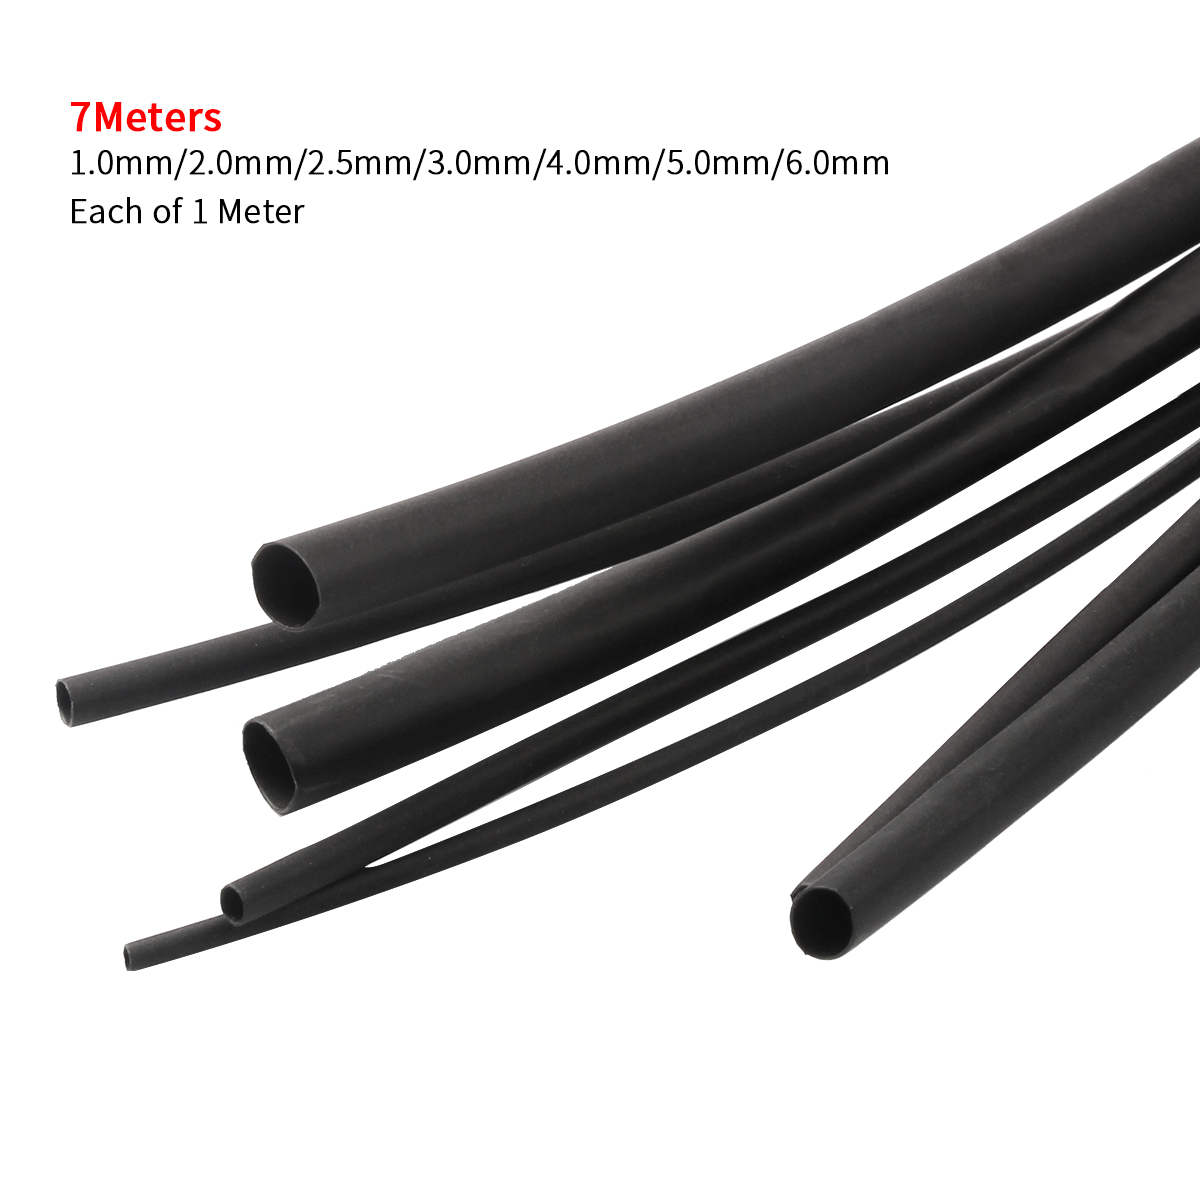 Sleeving //Tubing 6mm BLACK flexible PVC Sleeve 10 metres